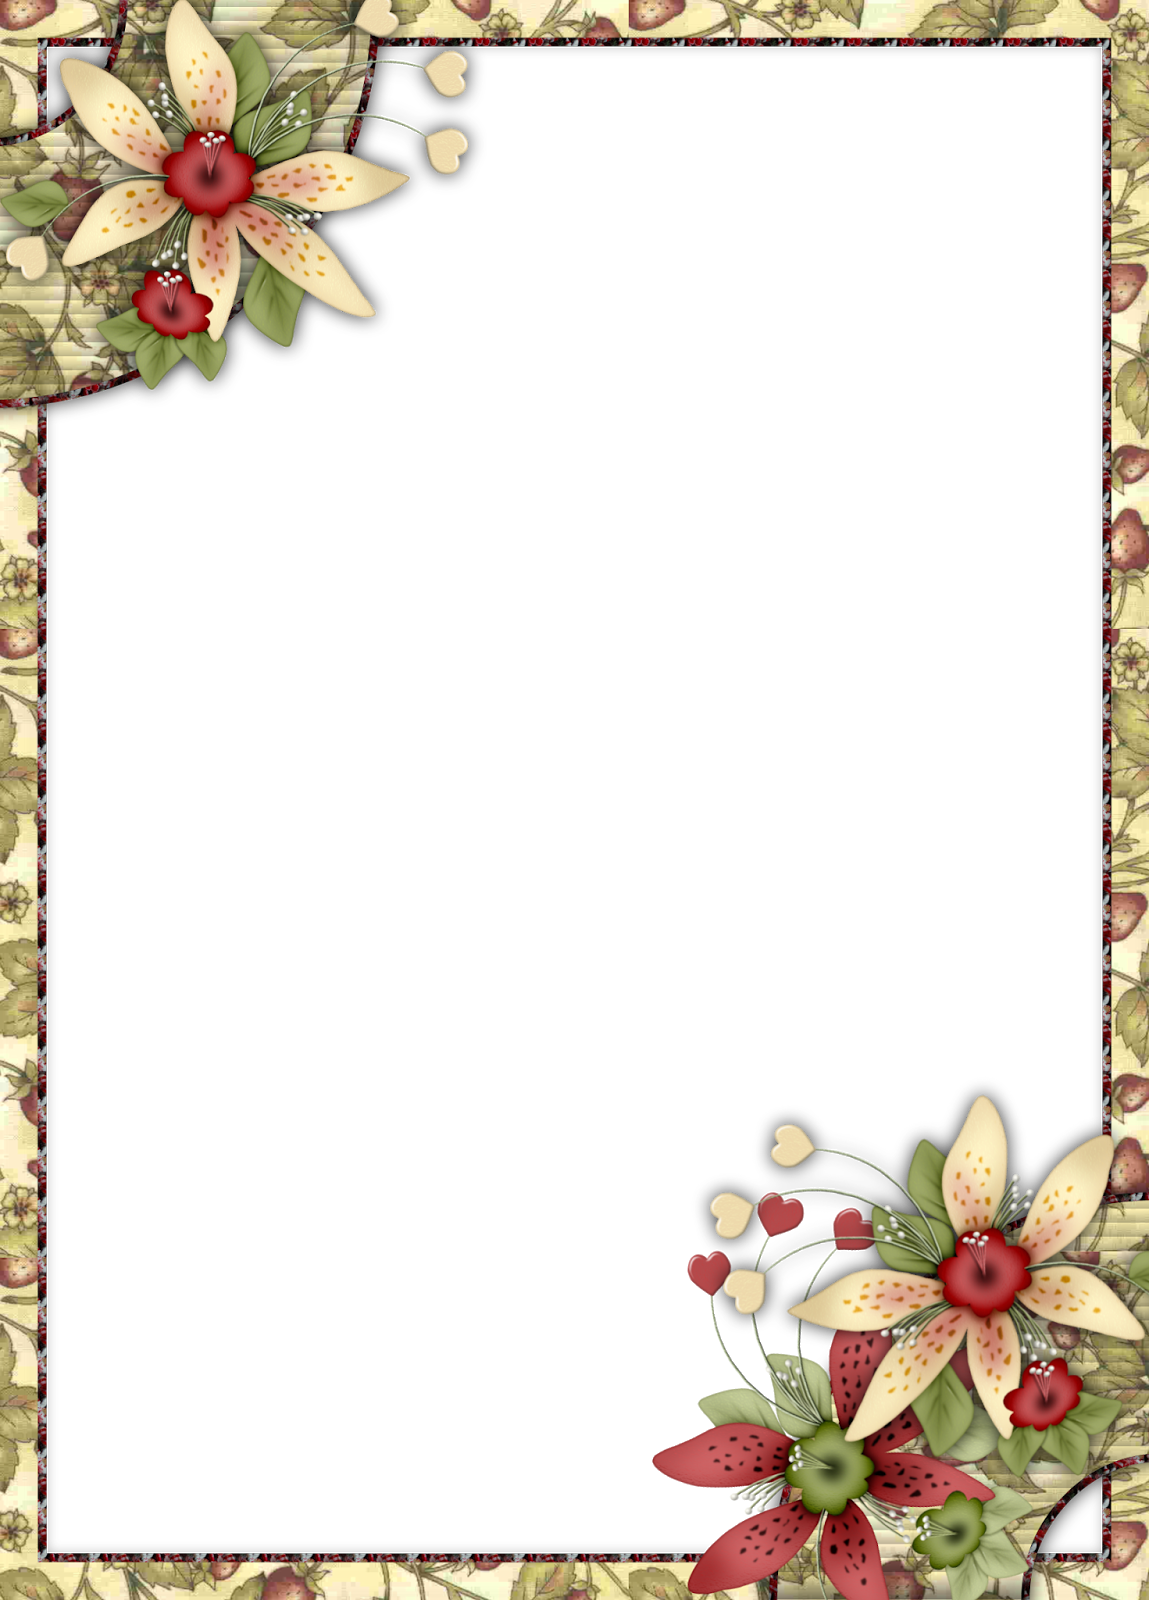 Flores retro marcos o tarjetas para imprimir gratis - Marcos de fotos de pared ...